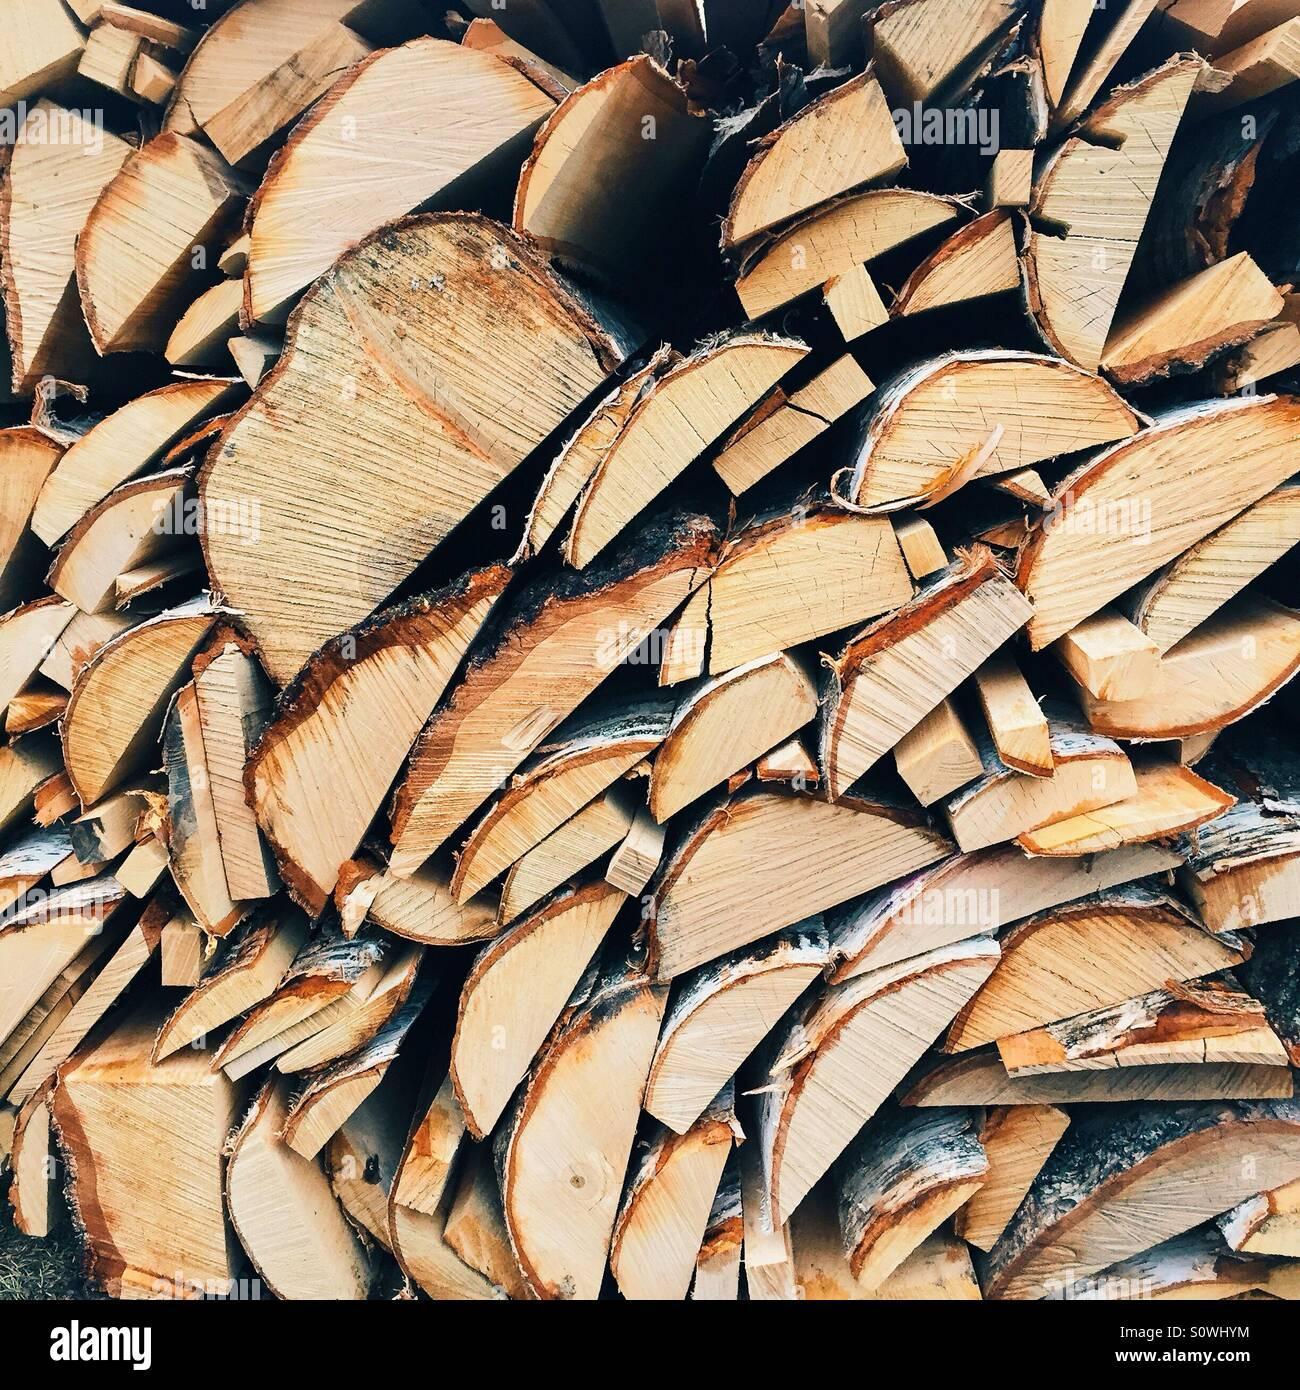 Brennholz für den Winter vorbereitet Stockbild